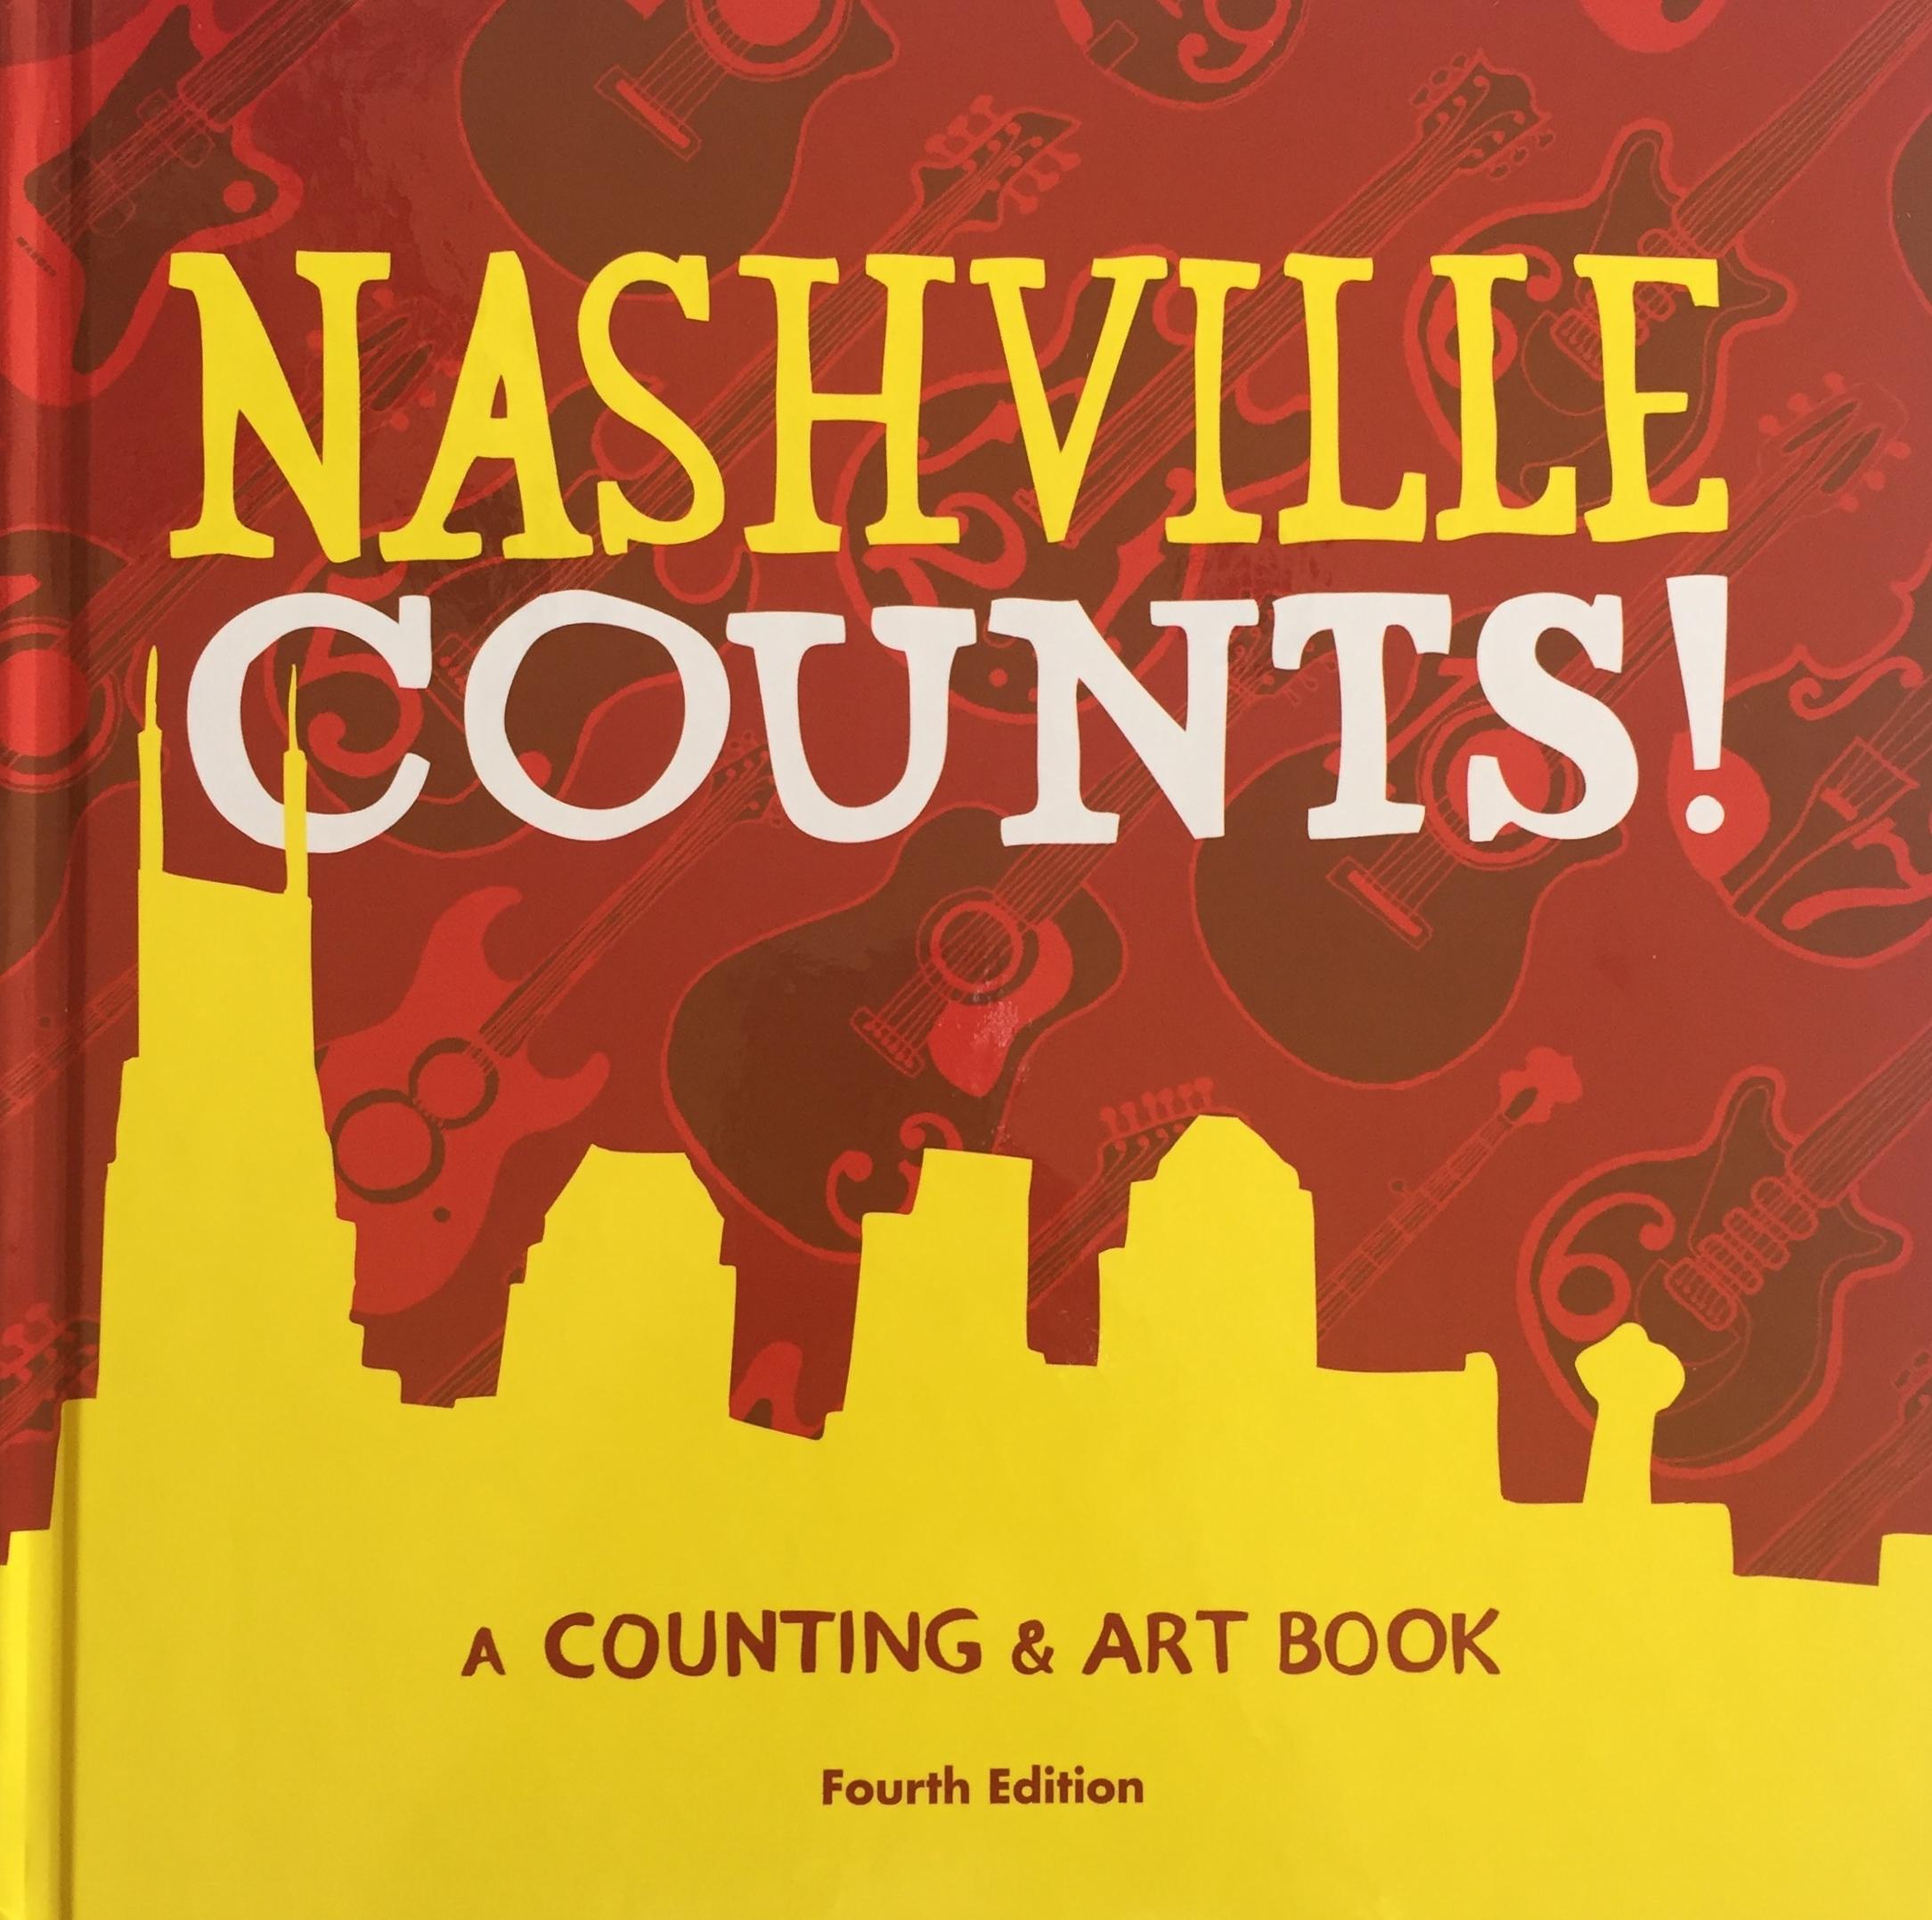 Nashville Counts.jpg